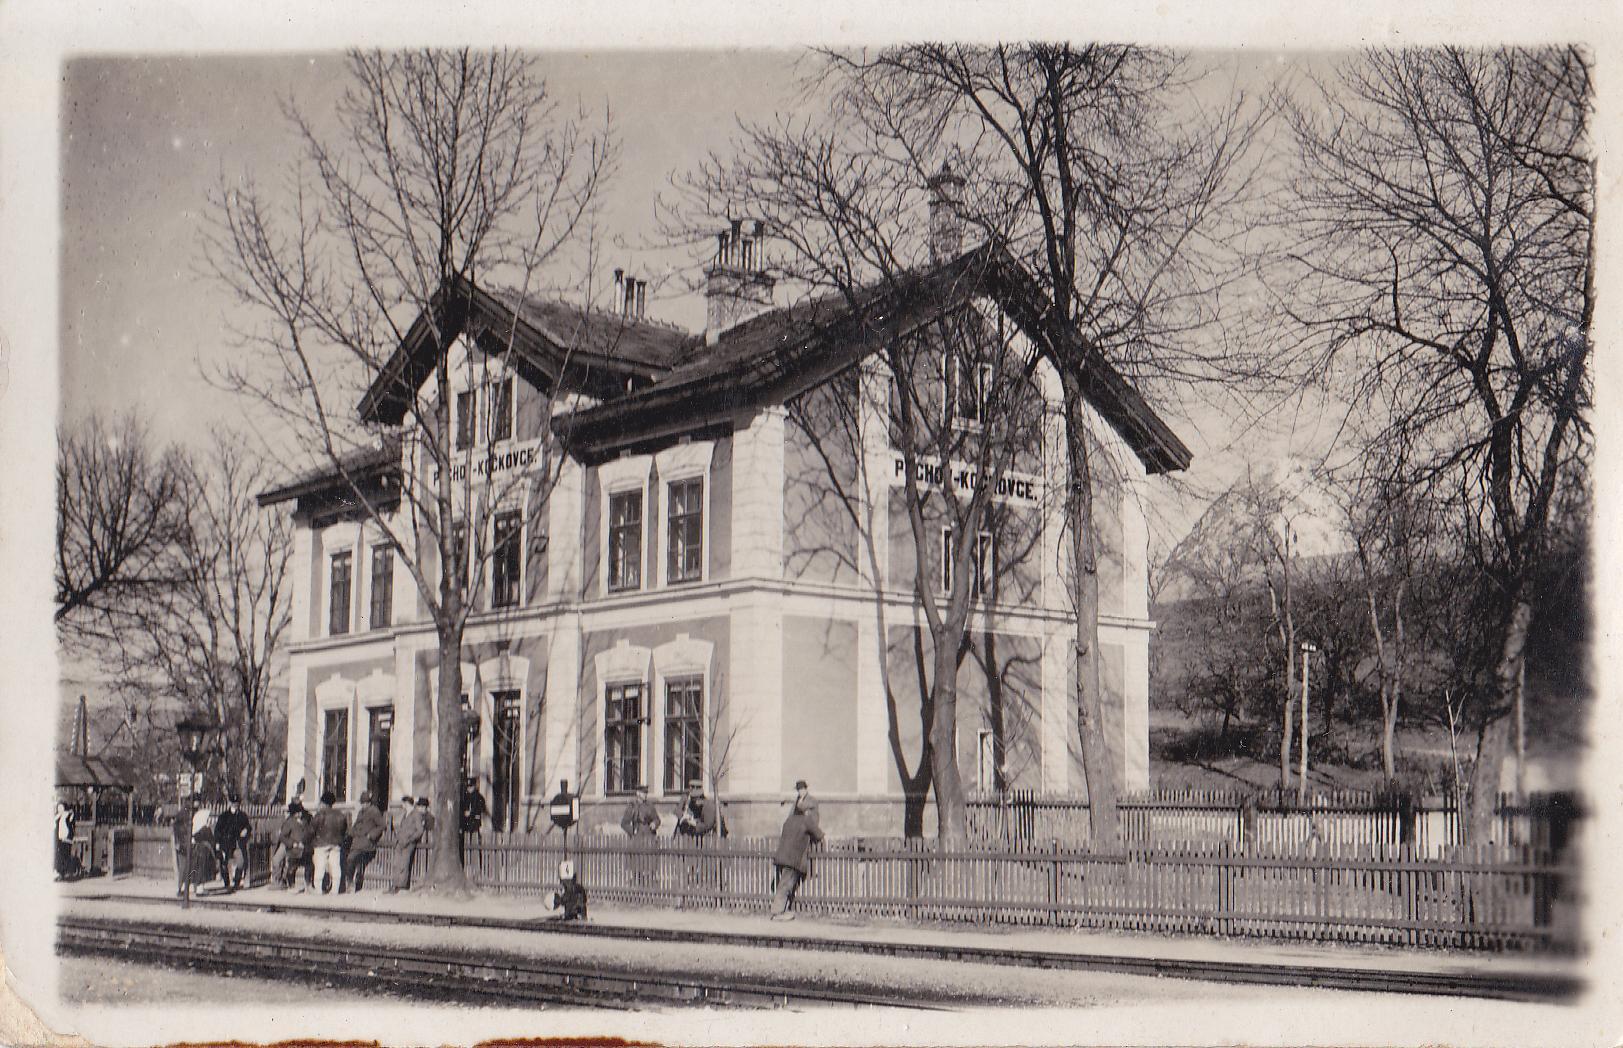 Historická budova žel. stanice v Púchove-Horných Kočkovciach z r. 1883 v čase 1. ČSR, a vzadu tzv. Kočkovská skala